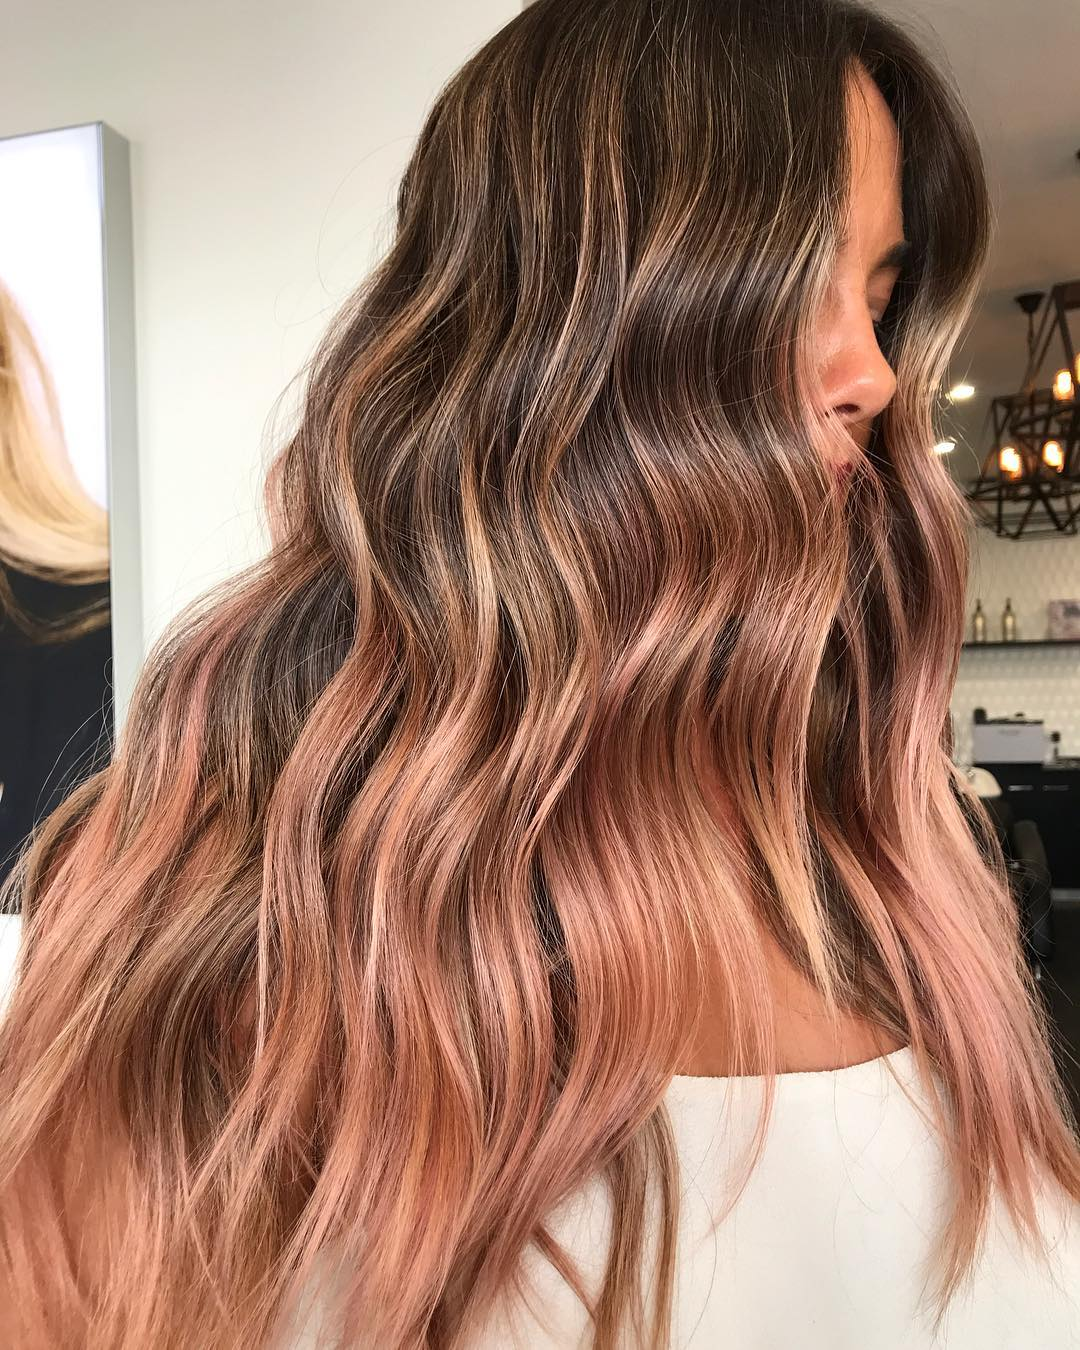 Окрашивание волос зима 2019-2020 фото 14